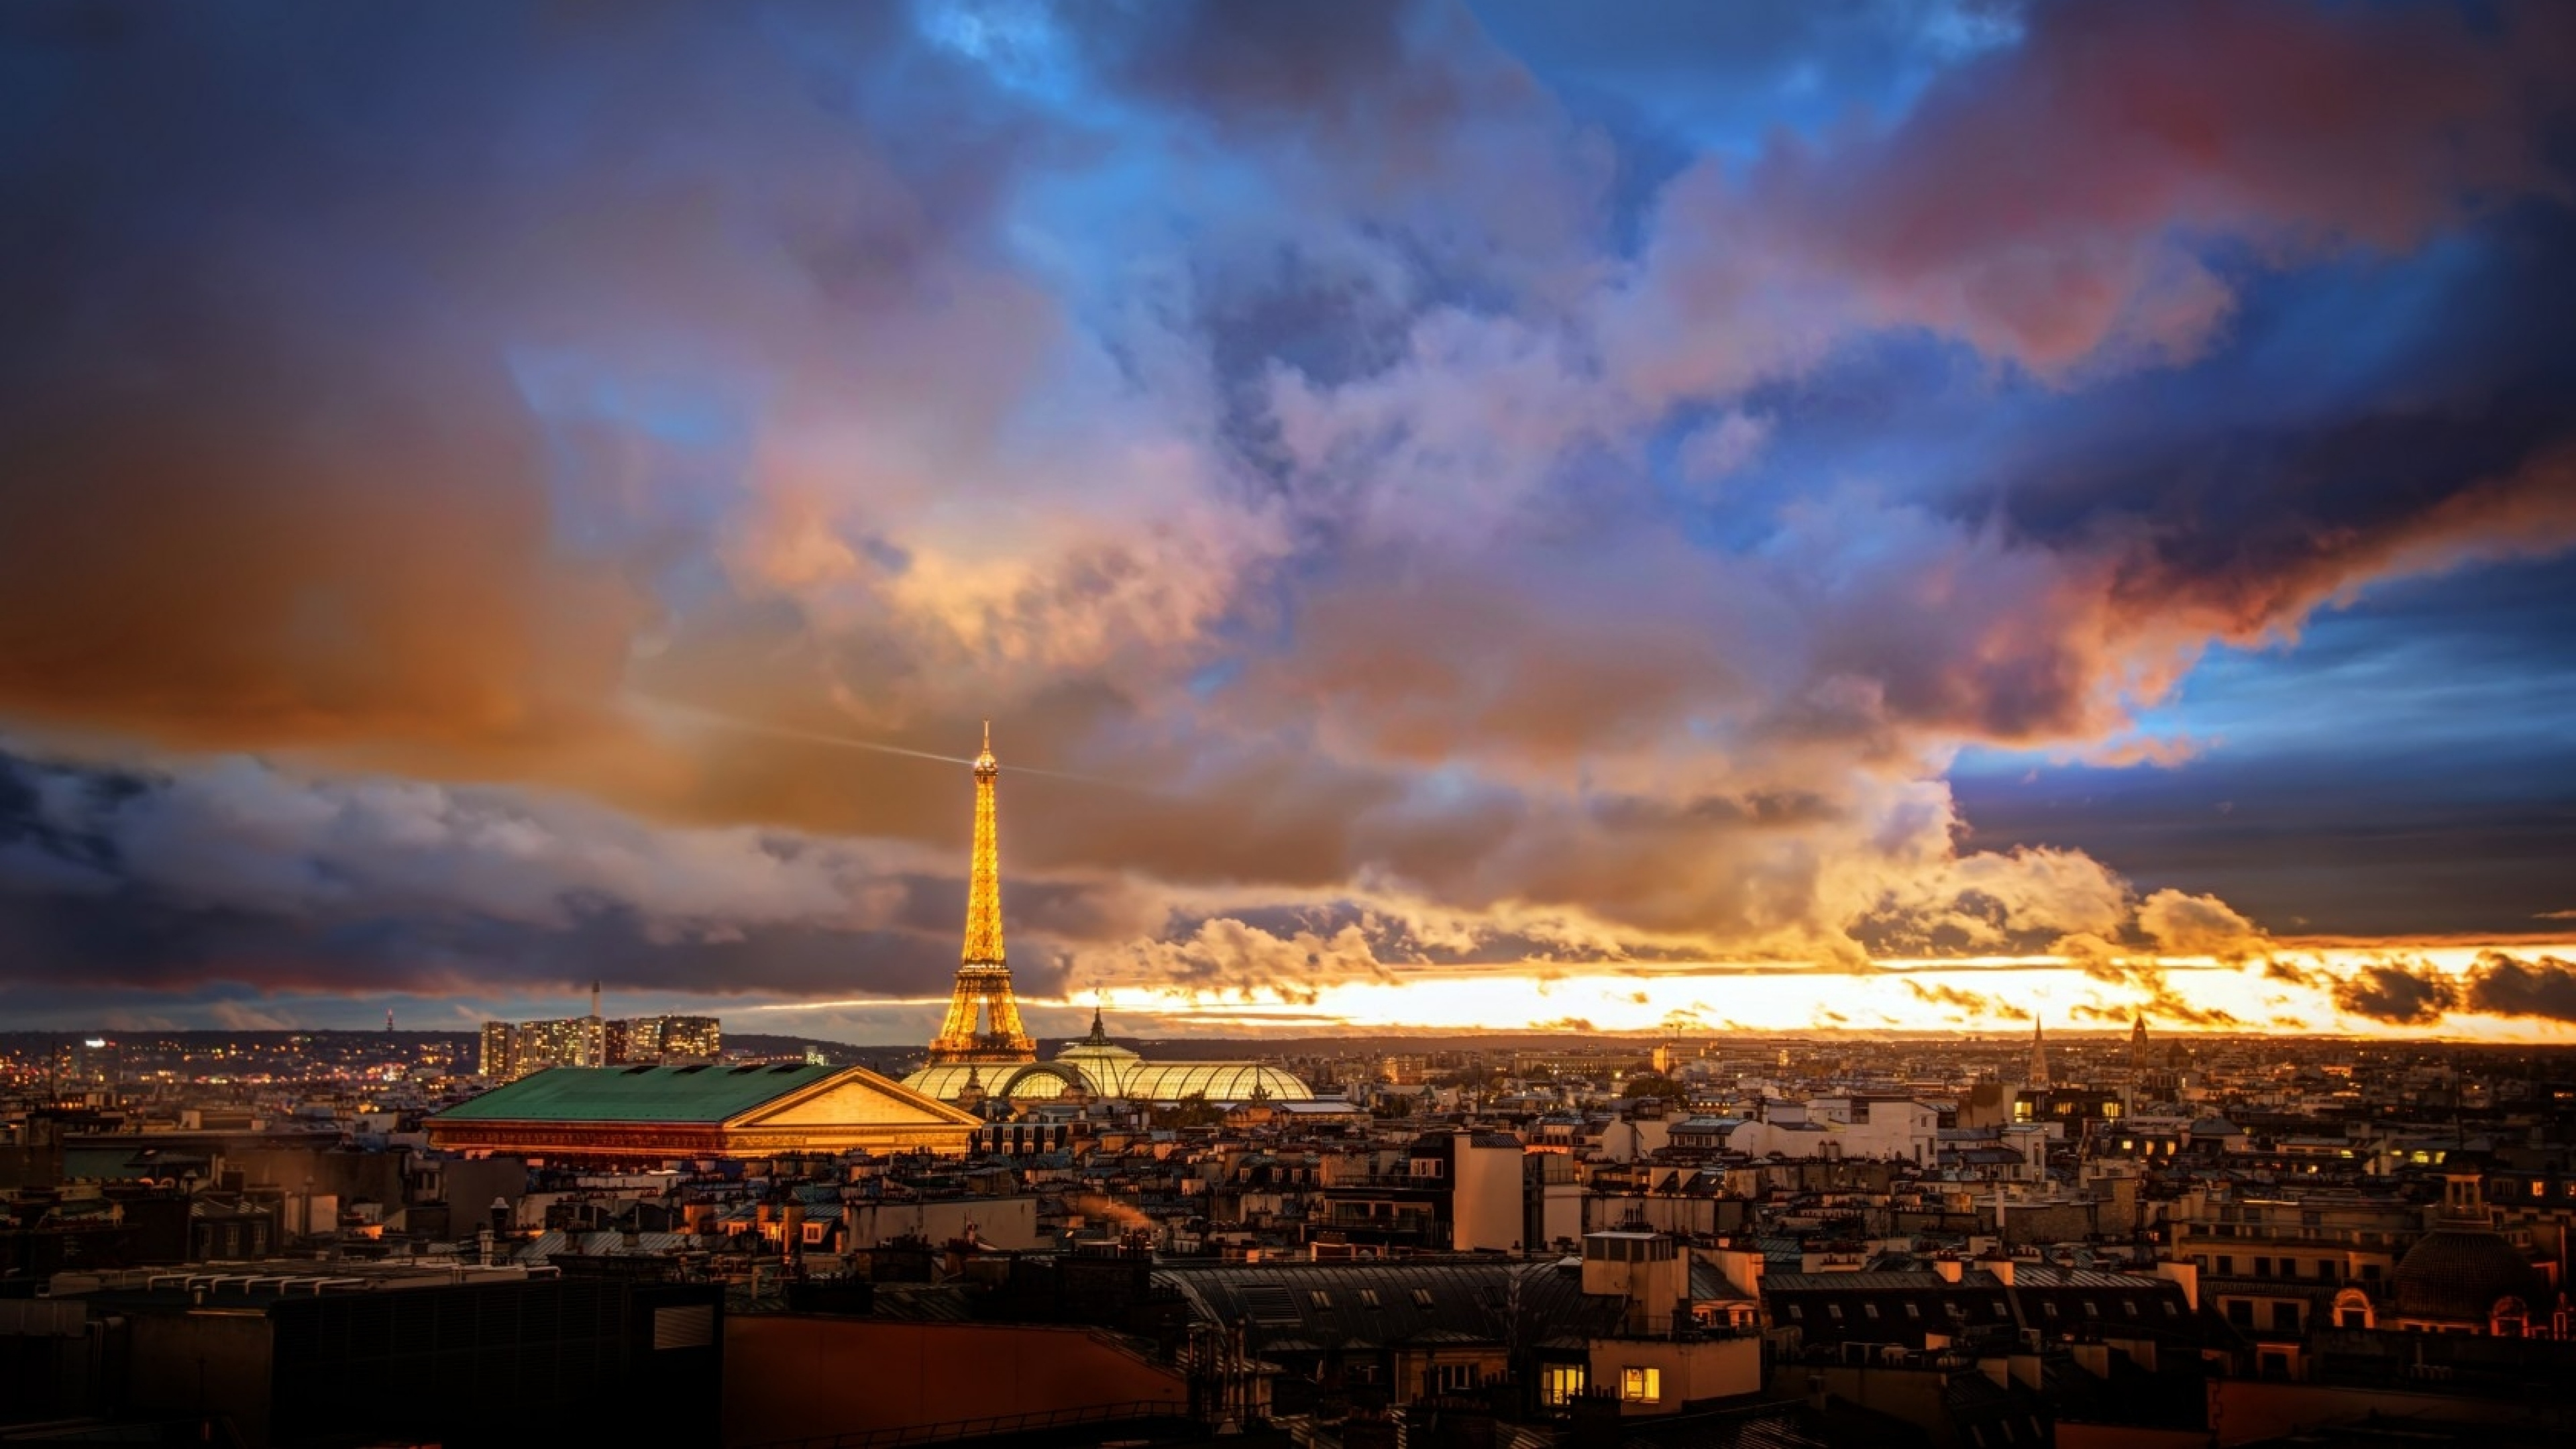 4k Wallpaper: 4K Eiffel Tower Wallpapers High Quality